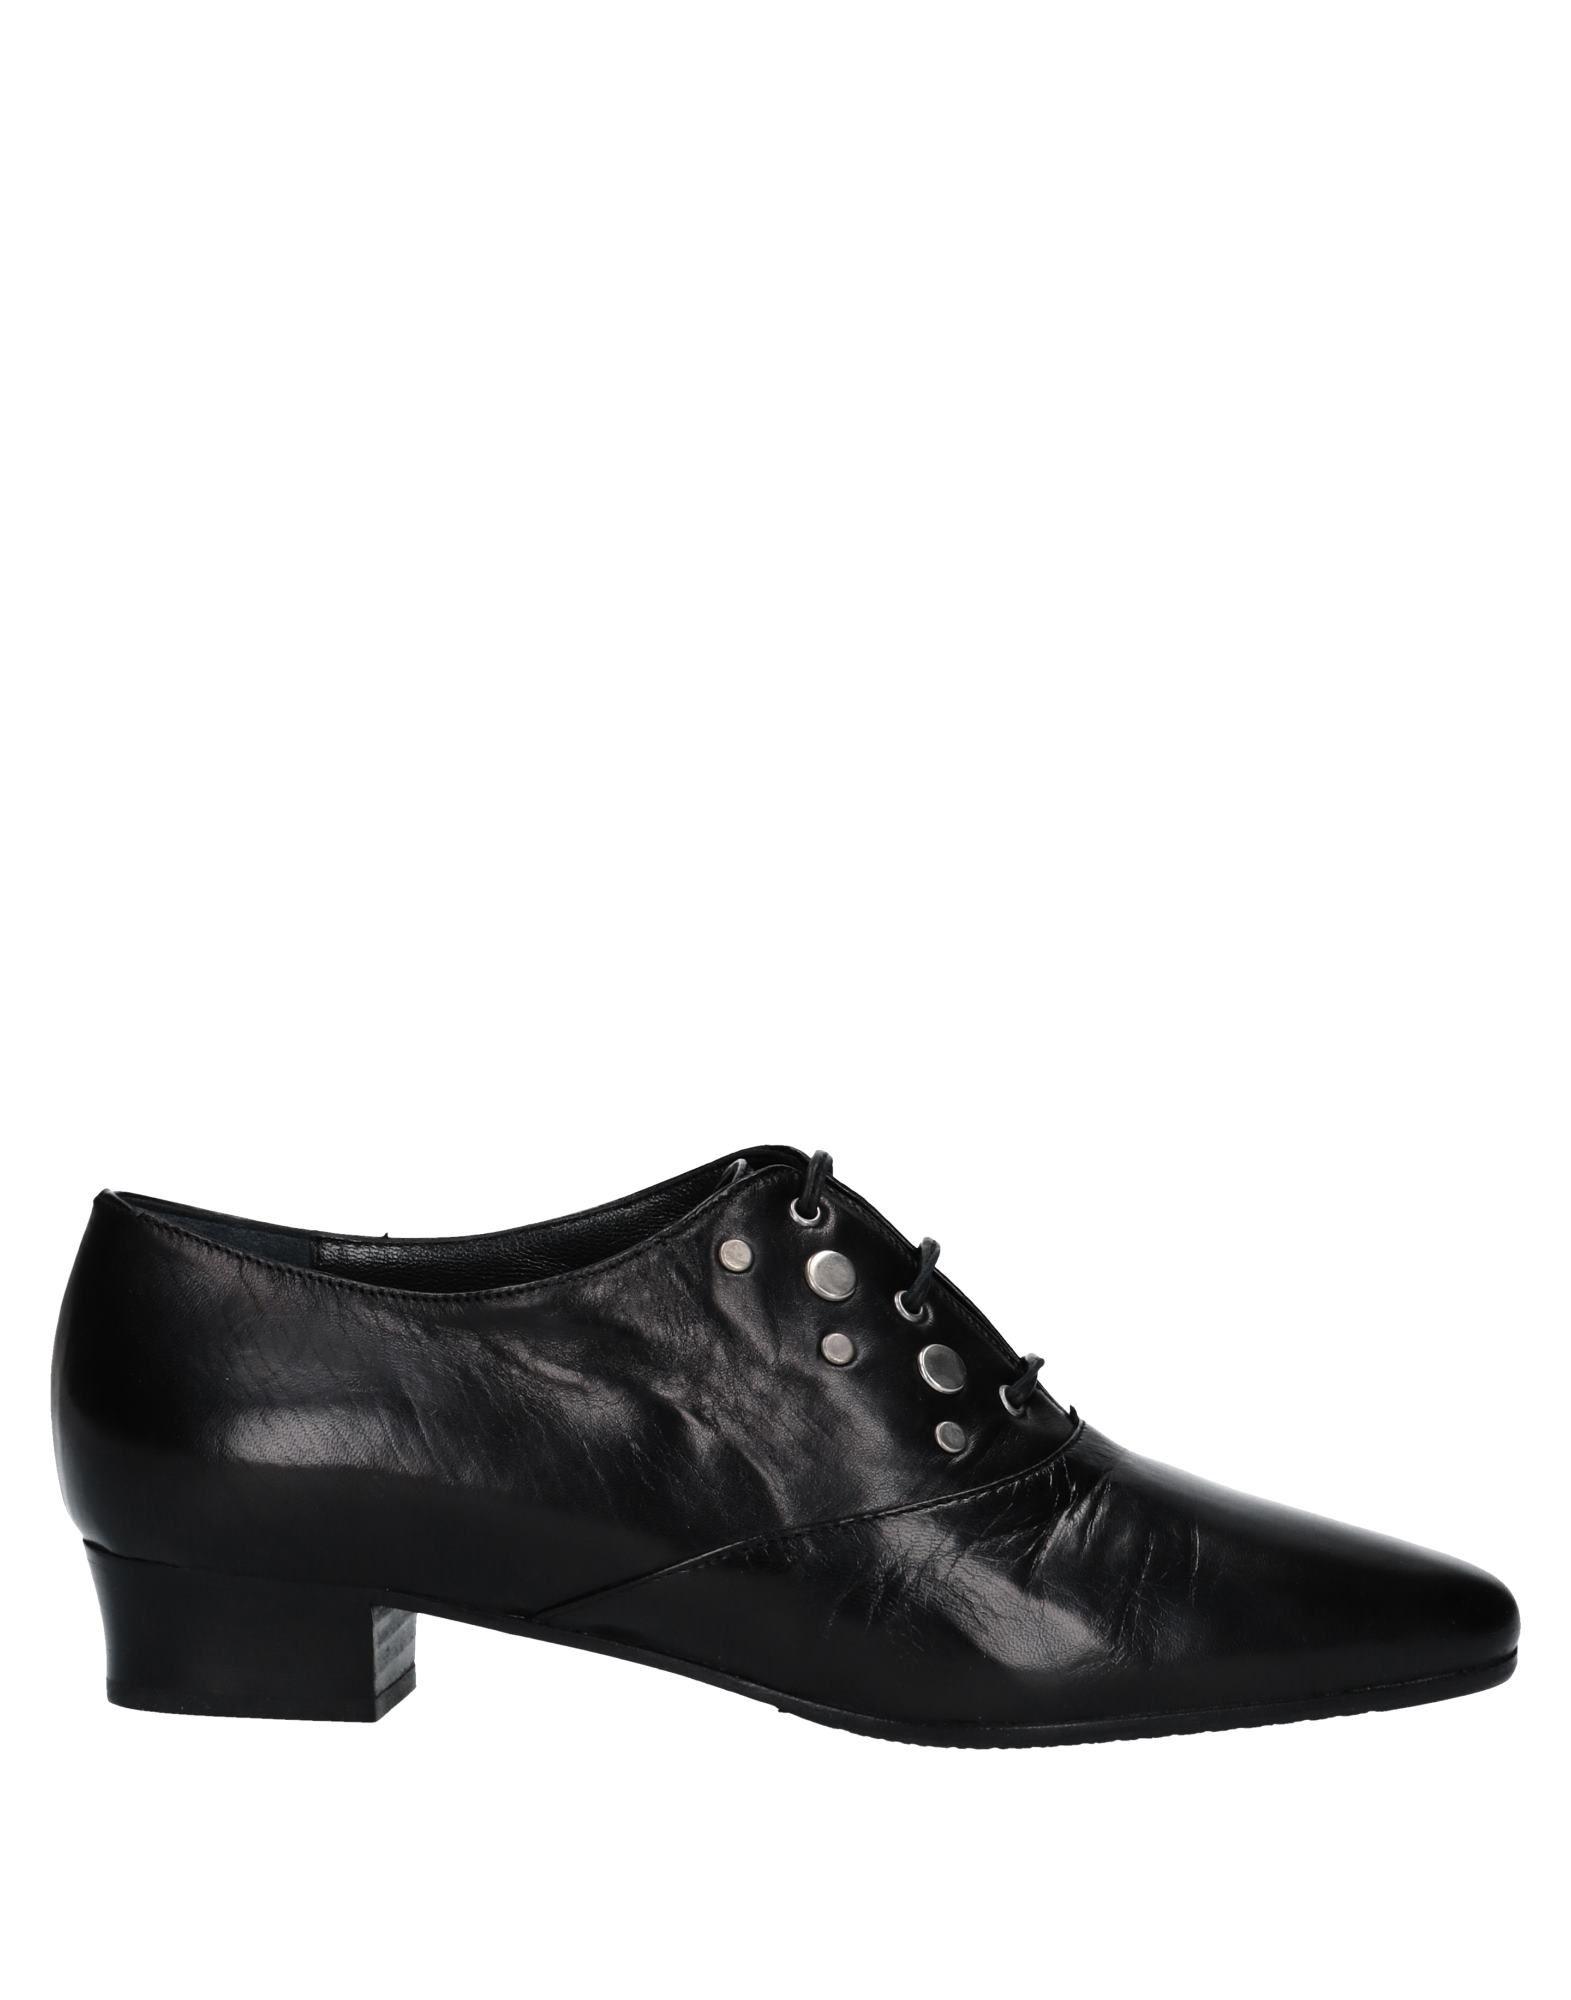 Фото - MODA ITALIA Обувь на шнурках обувь на высокой платформе dkny